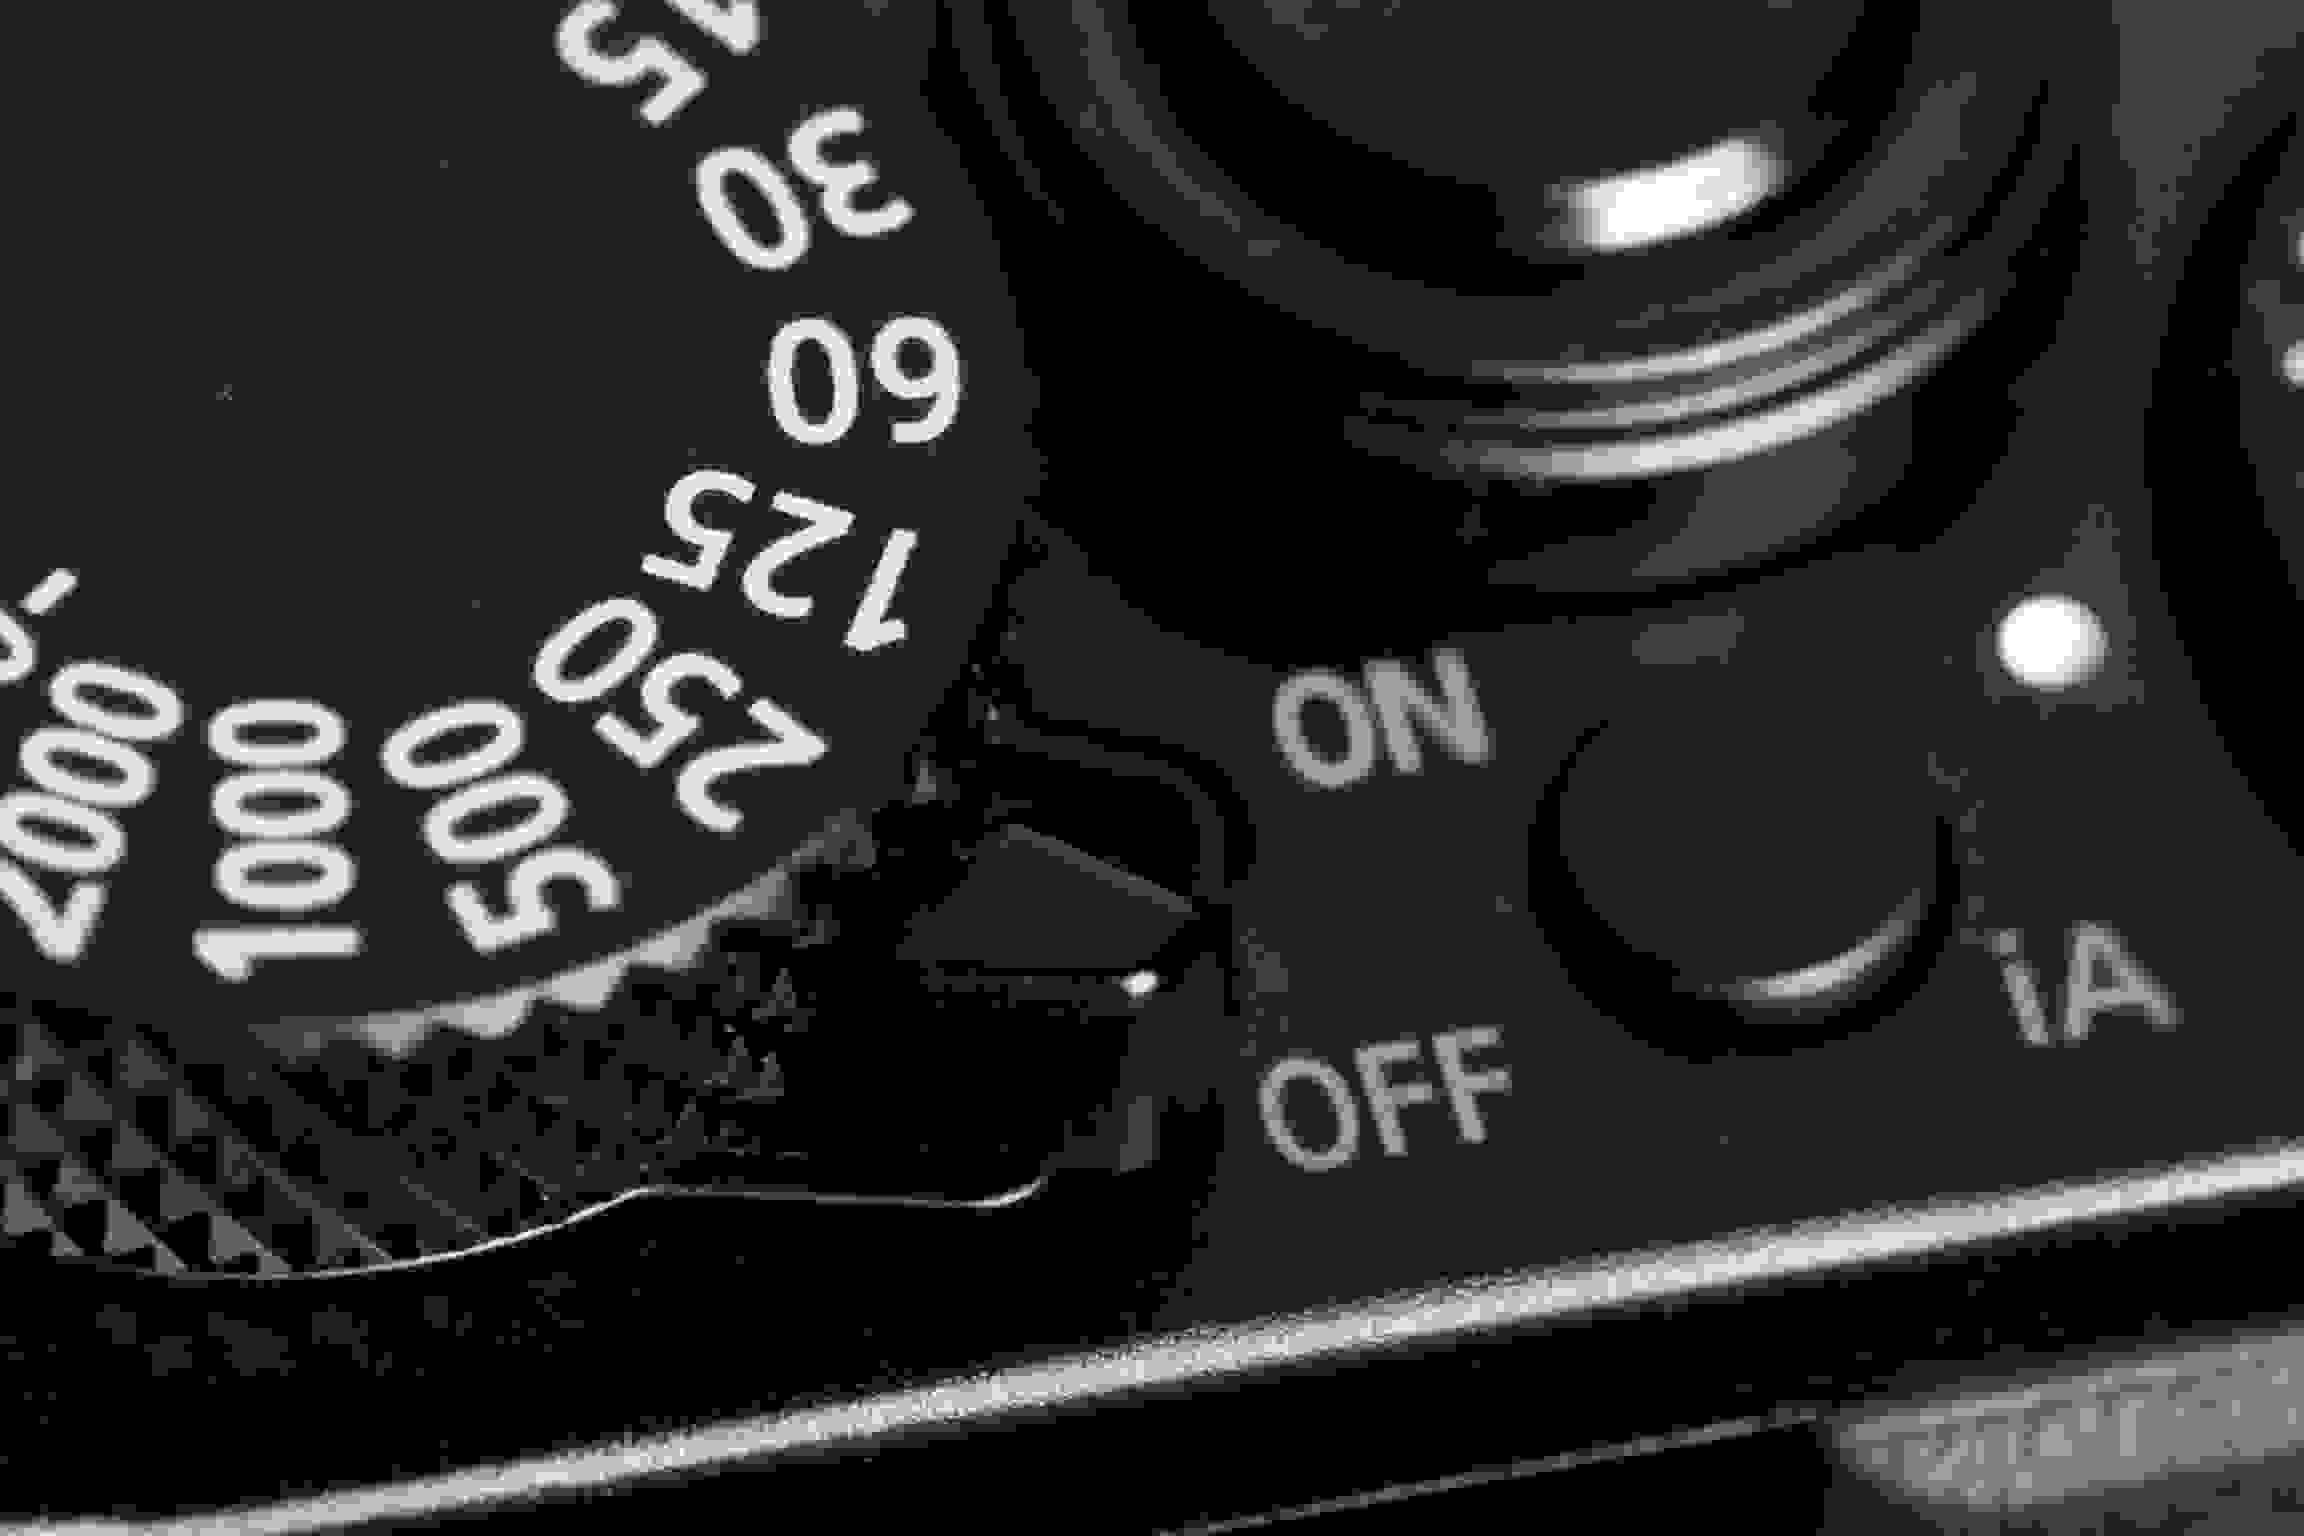 A photograph of the Panasonic Lumix LX100's power switch.